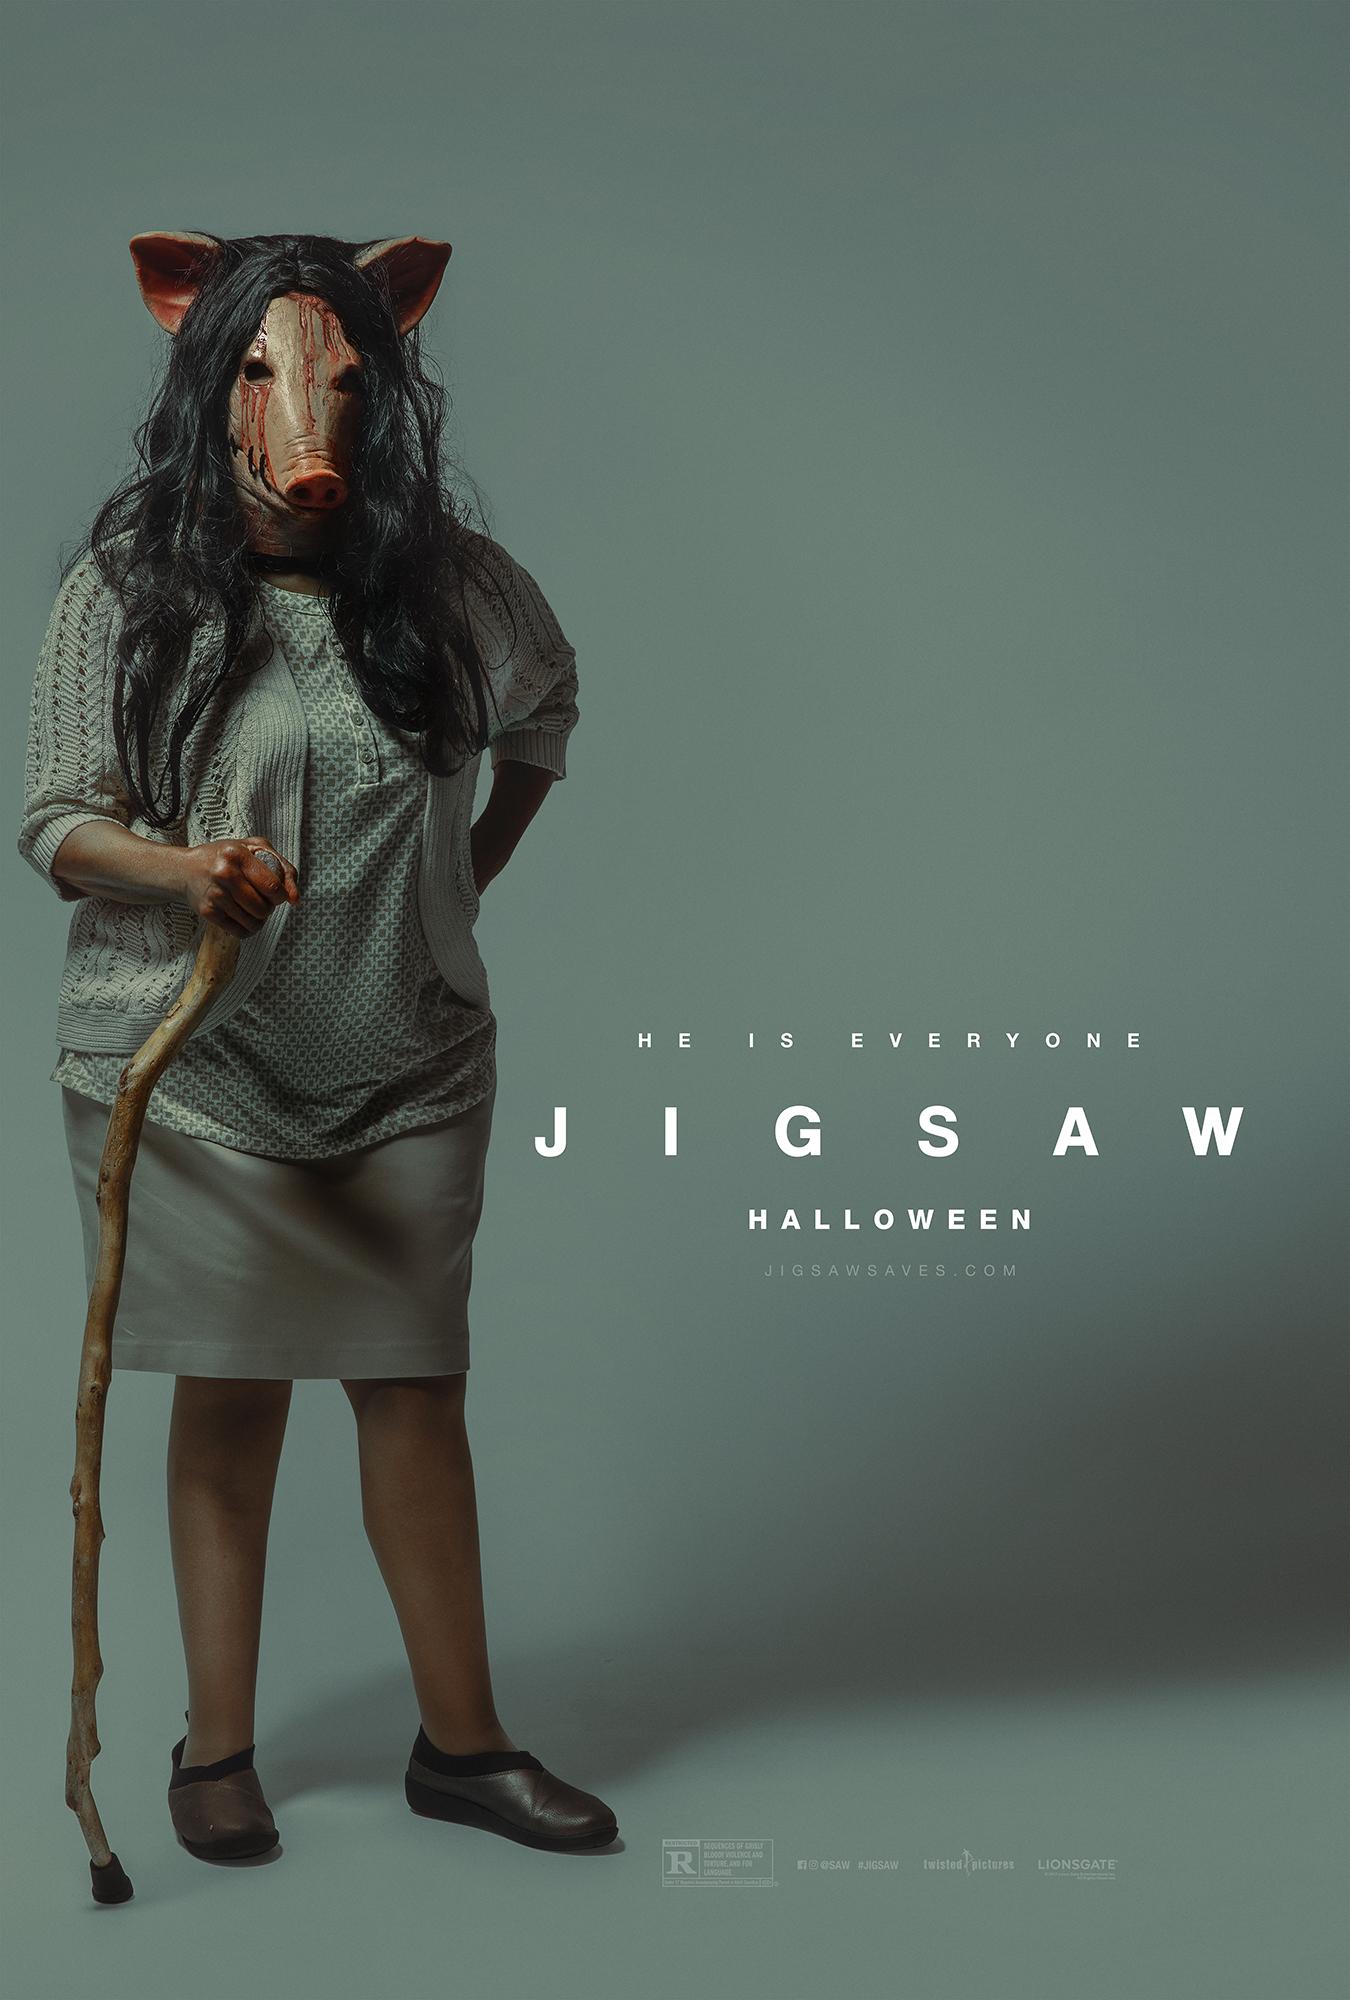 Jigsaw_1Sht_Online_Grandma_100dpi.jpg